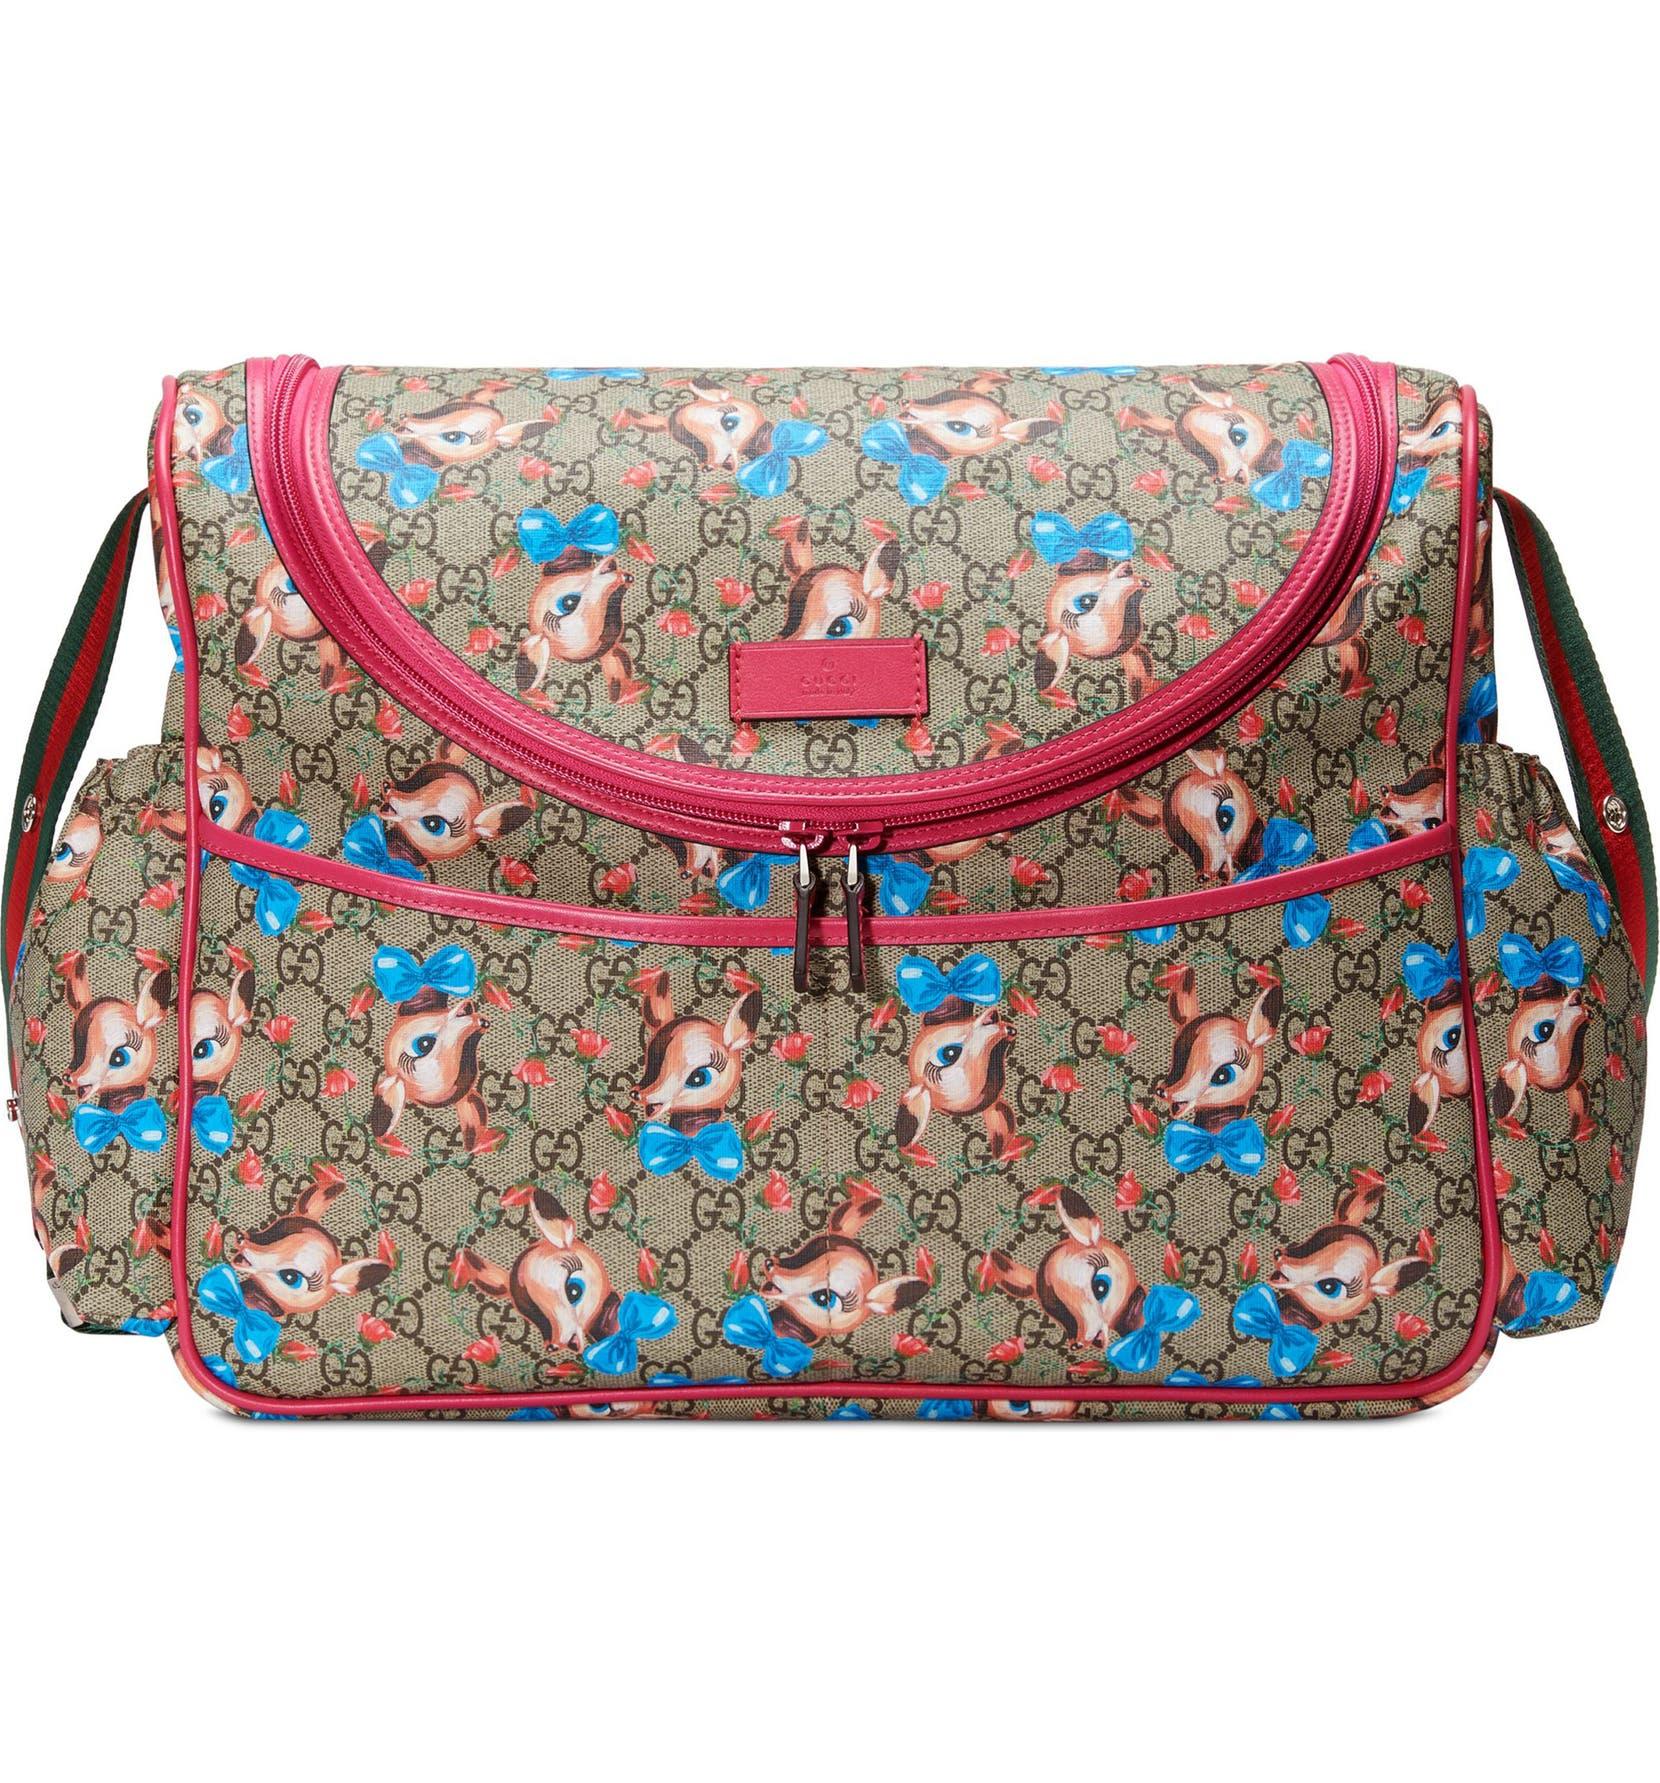 33c4be85b16f Gucci Deer & Rose Bud GG Supreme Canvas Diaper Bag | Nordstrom